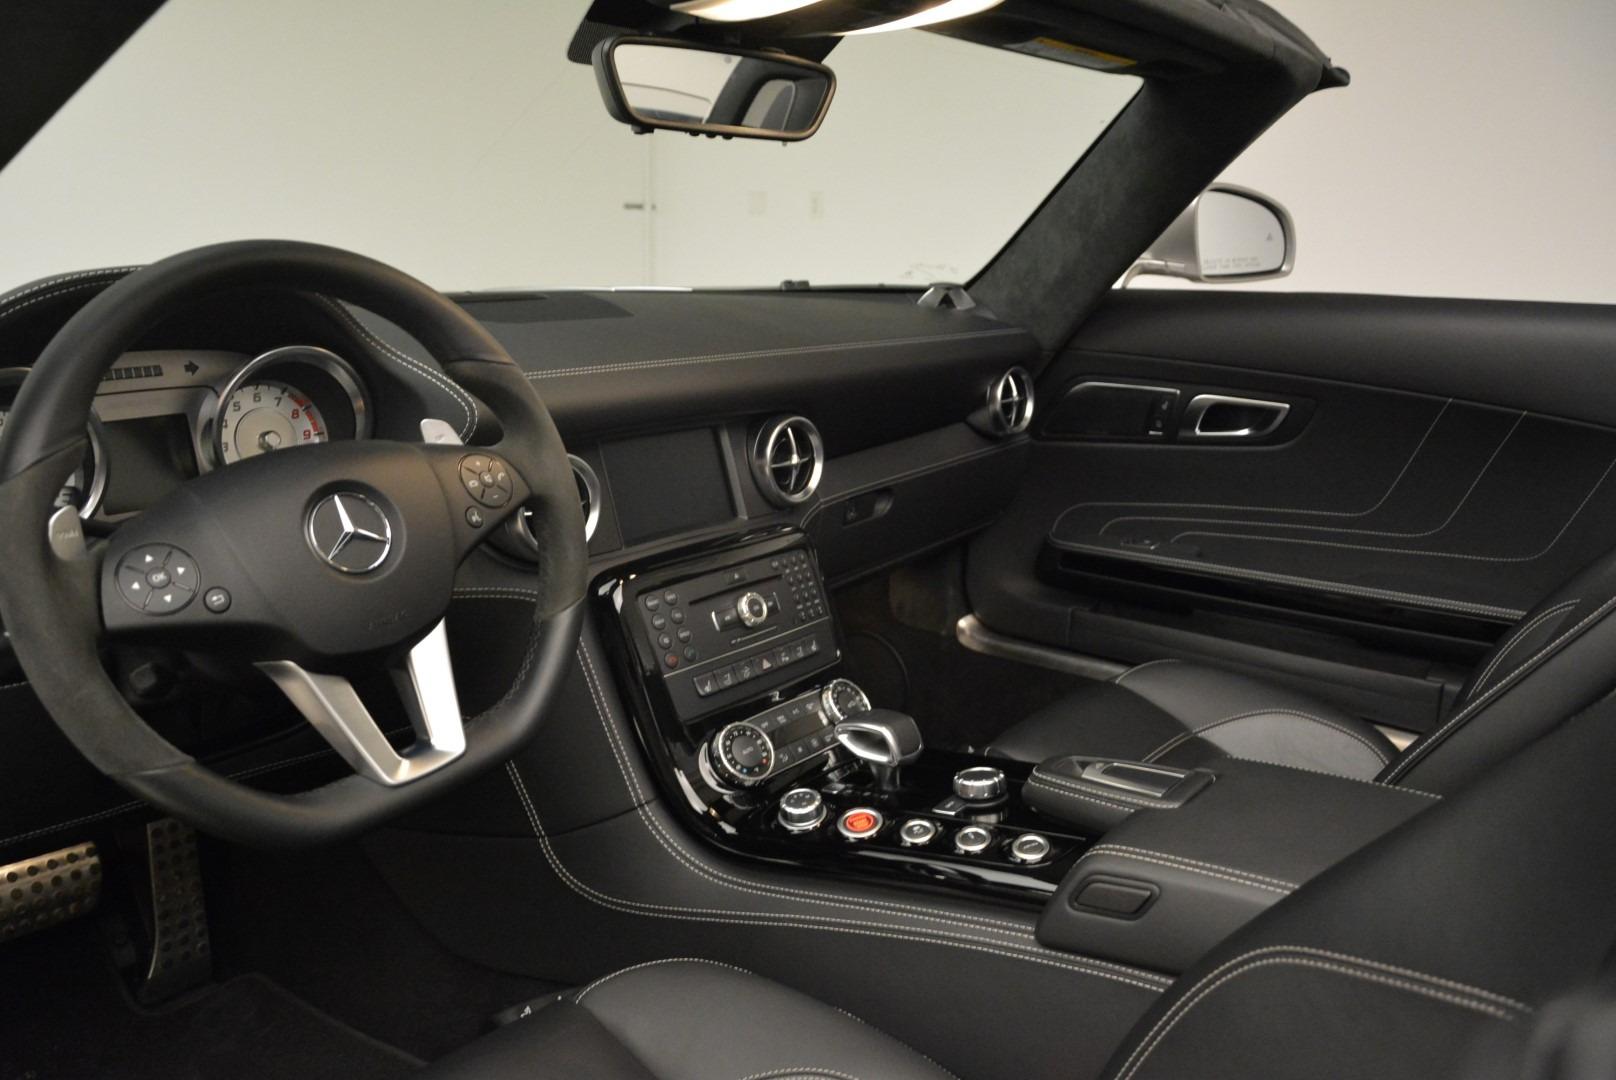 Used 2012 Mercedes-Benz SLS AMG  For Sale In Westport, CT 2068_p23